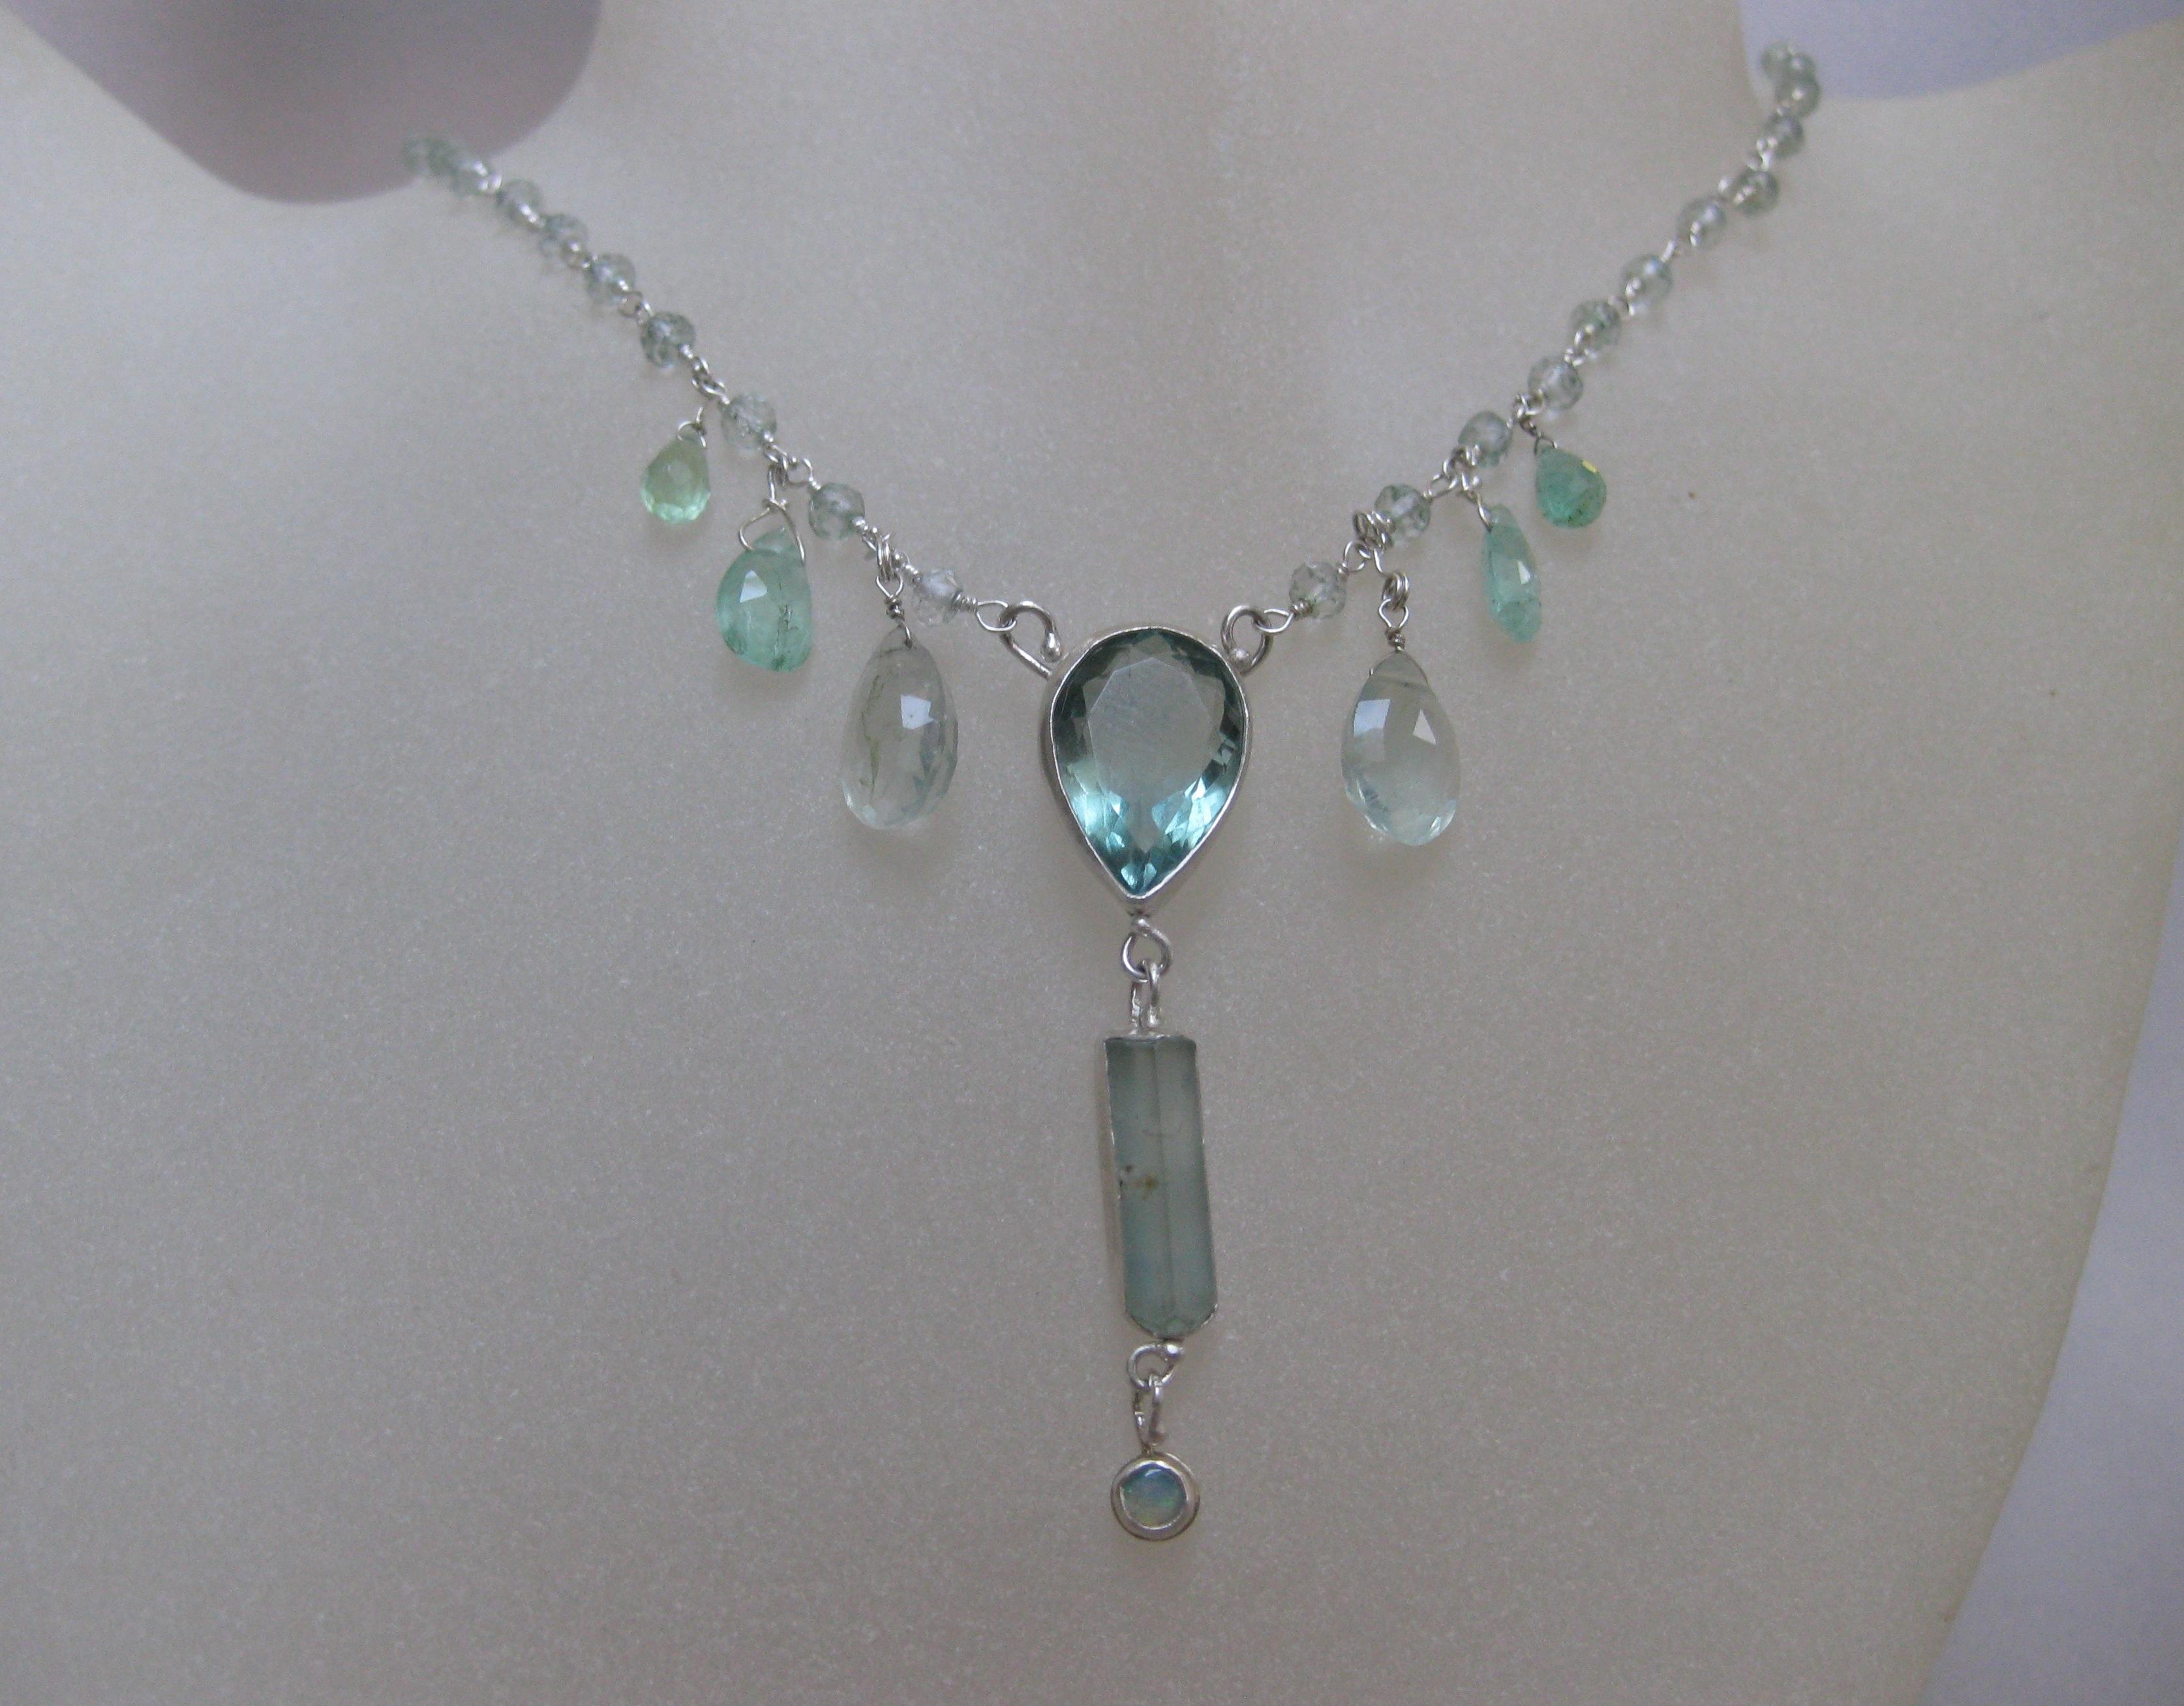 Necklace with Raw Aquamarine Crystal Fluorite & Emerald Briolettes Pear Fluorite  Australian Opal on Green Amethyst (Priasolite) & Silver Chain